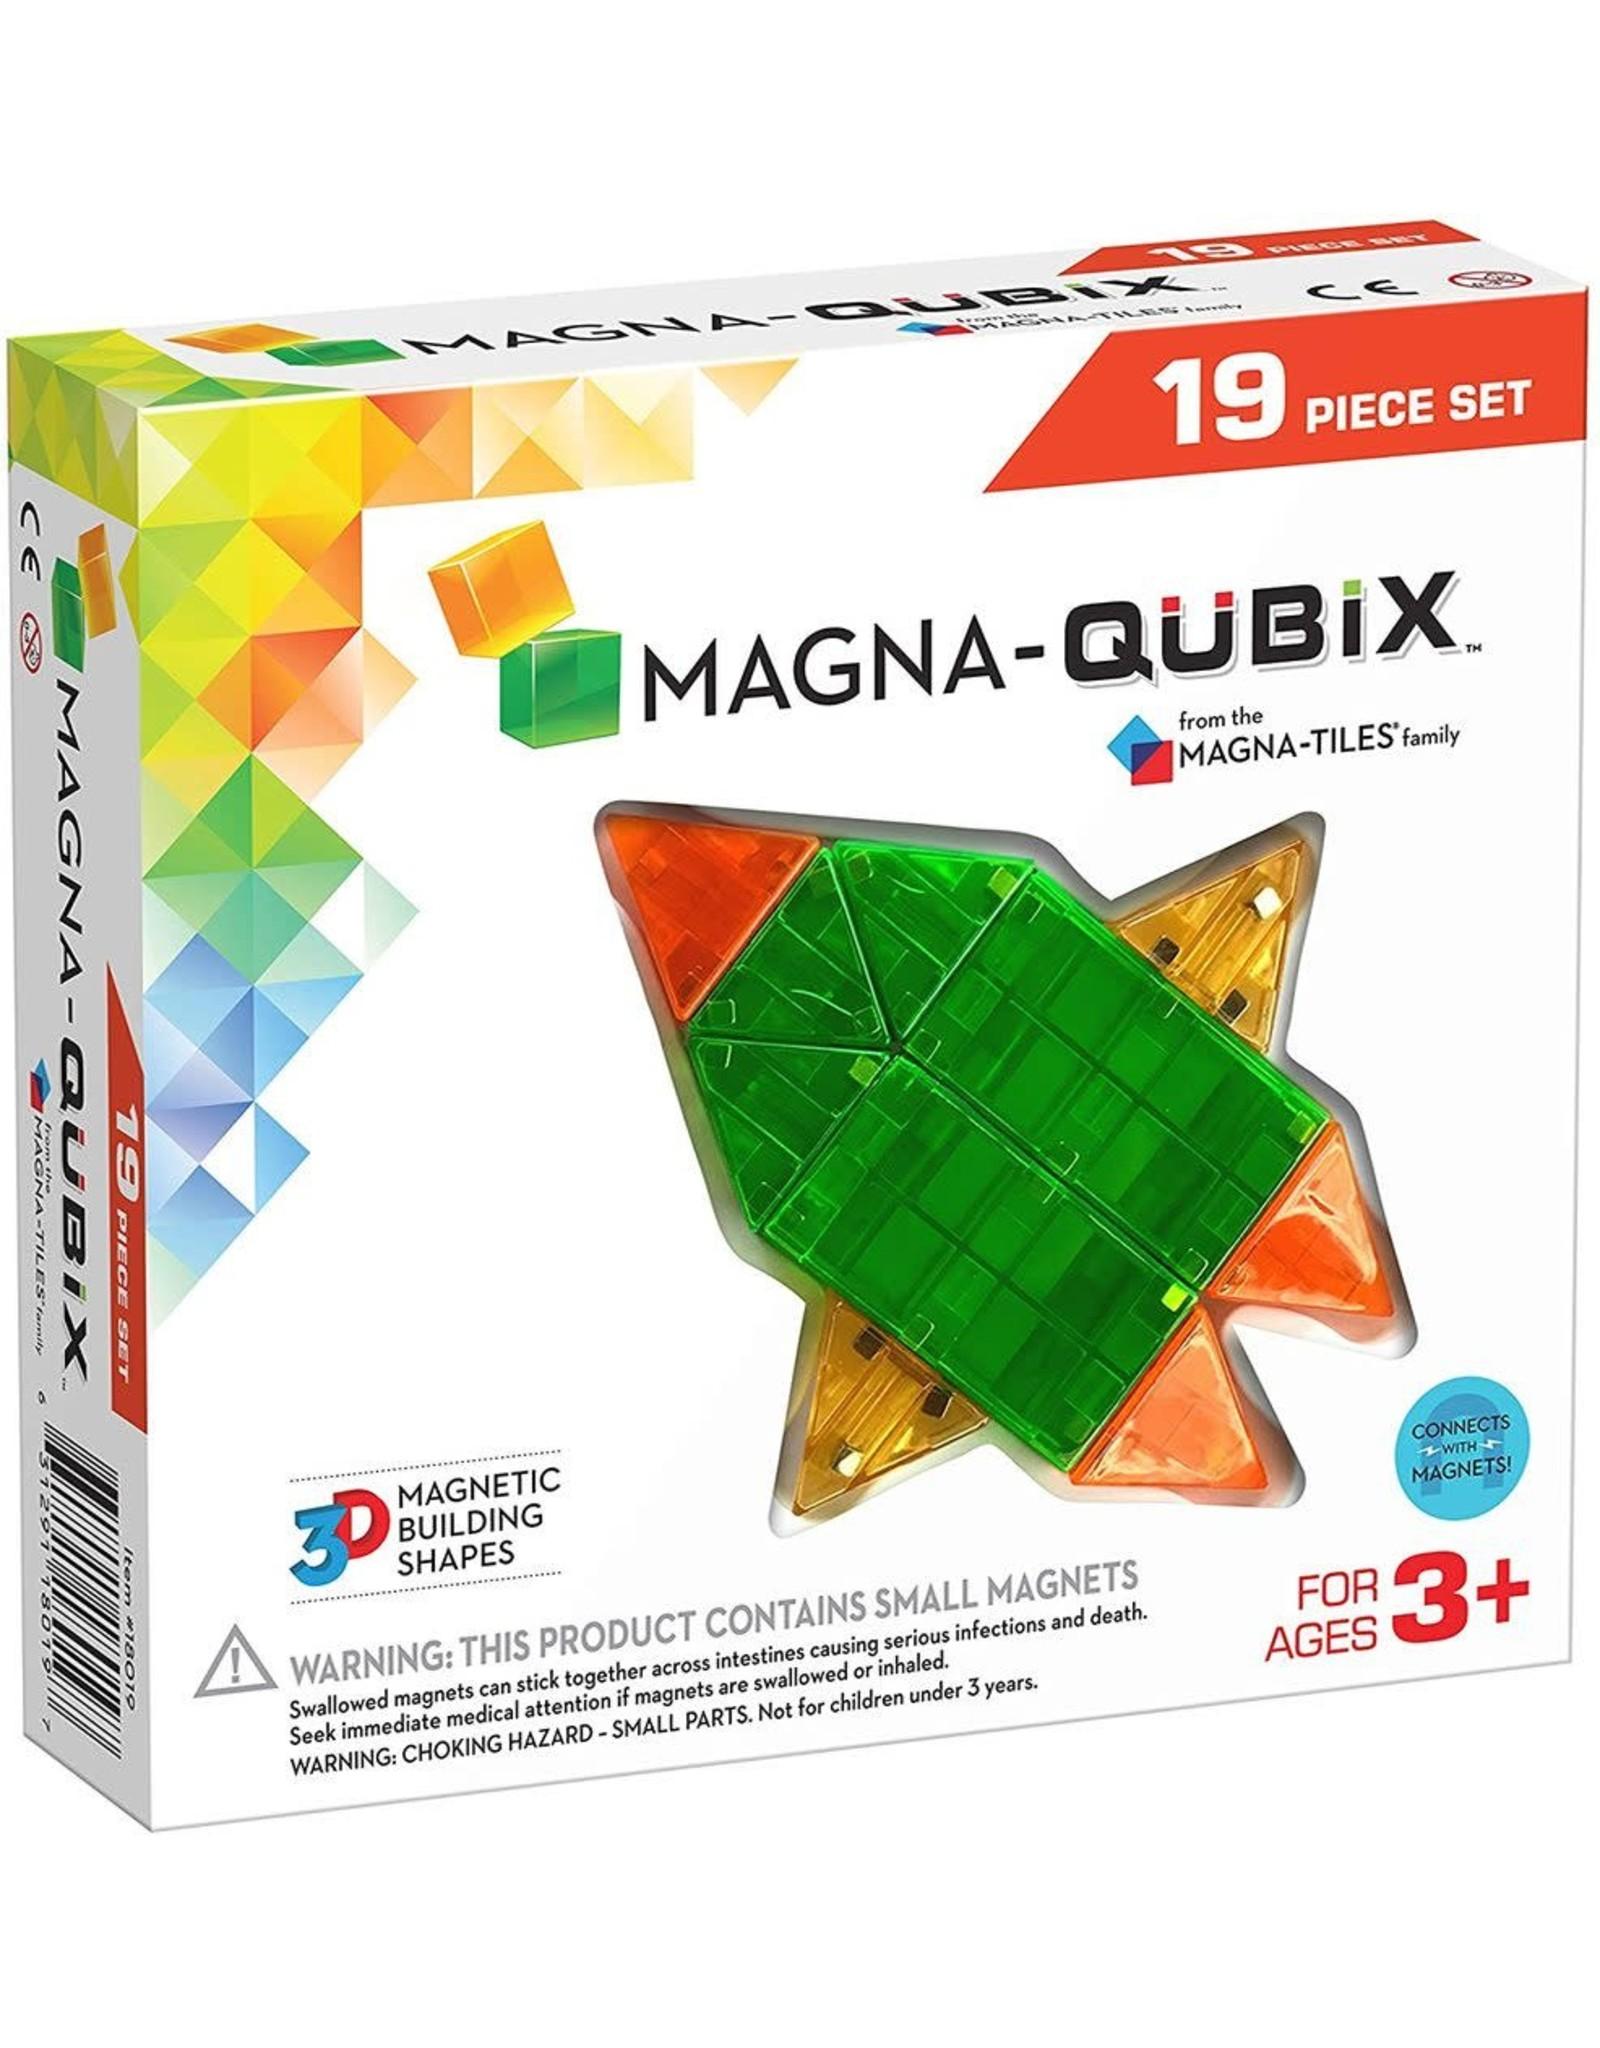 Magna-Tiles Magna-Qubix